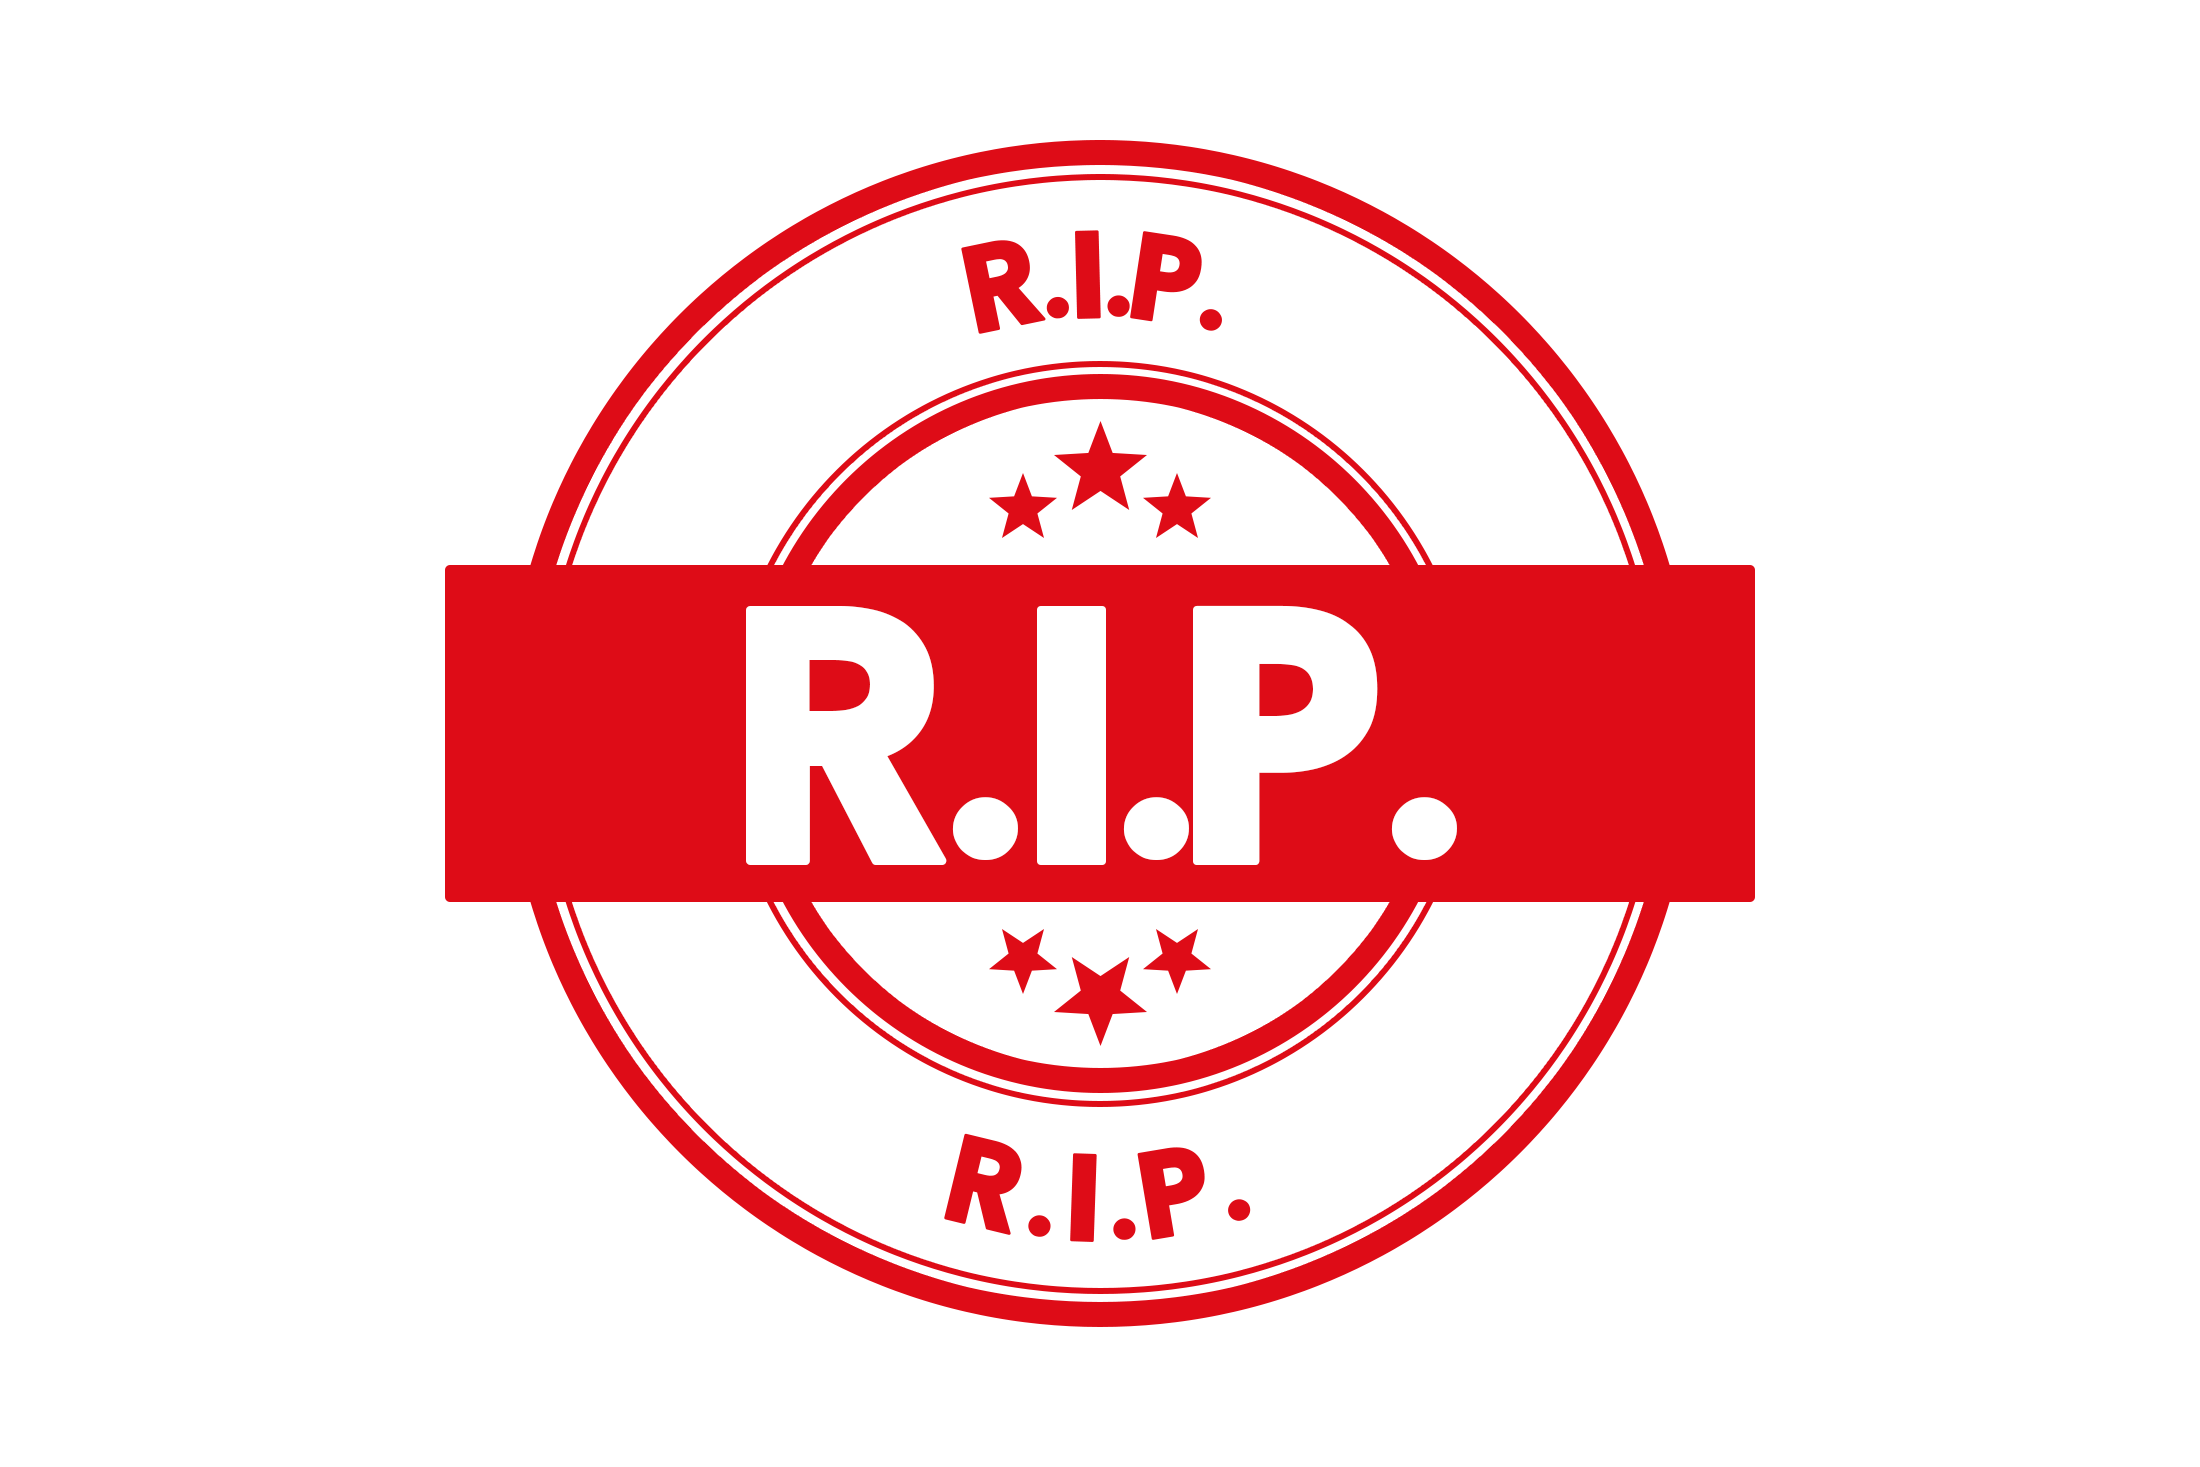 Round r.i.p. stamp PSD